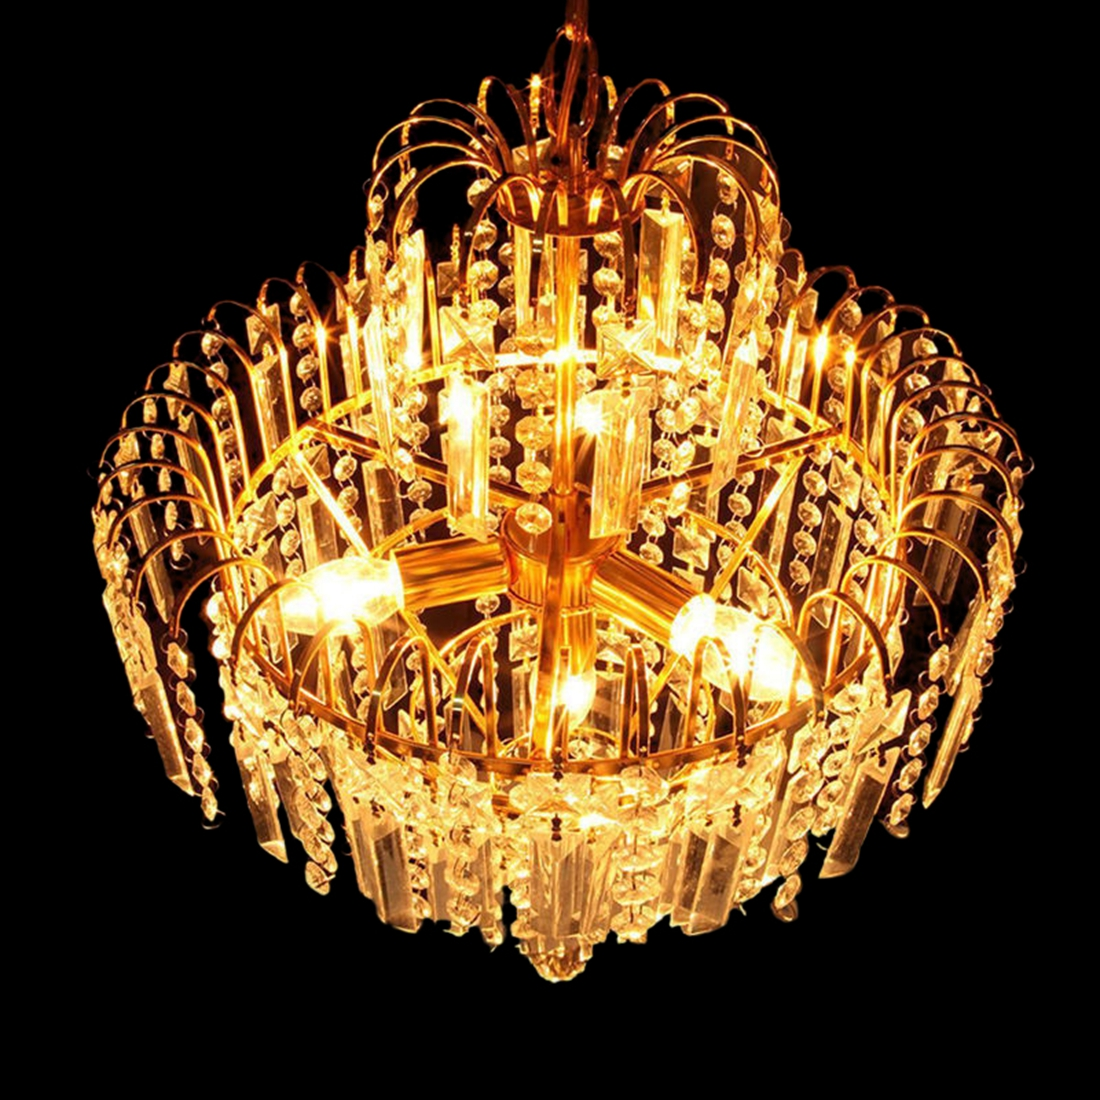 Big crystal chandelier modern ceiling light lamp pendant lighting fixture s ebay - Ceiling crystal chandelier ...